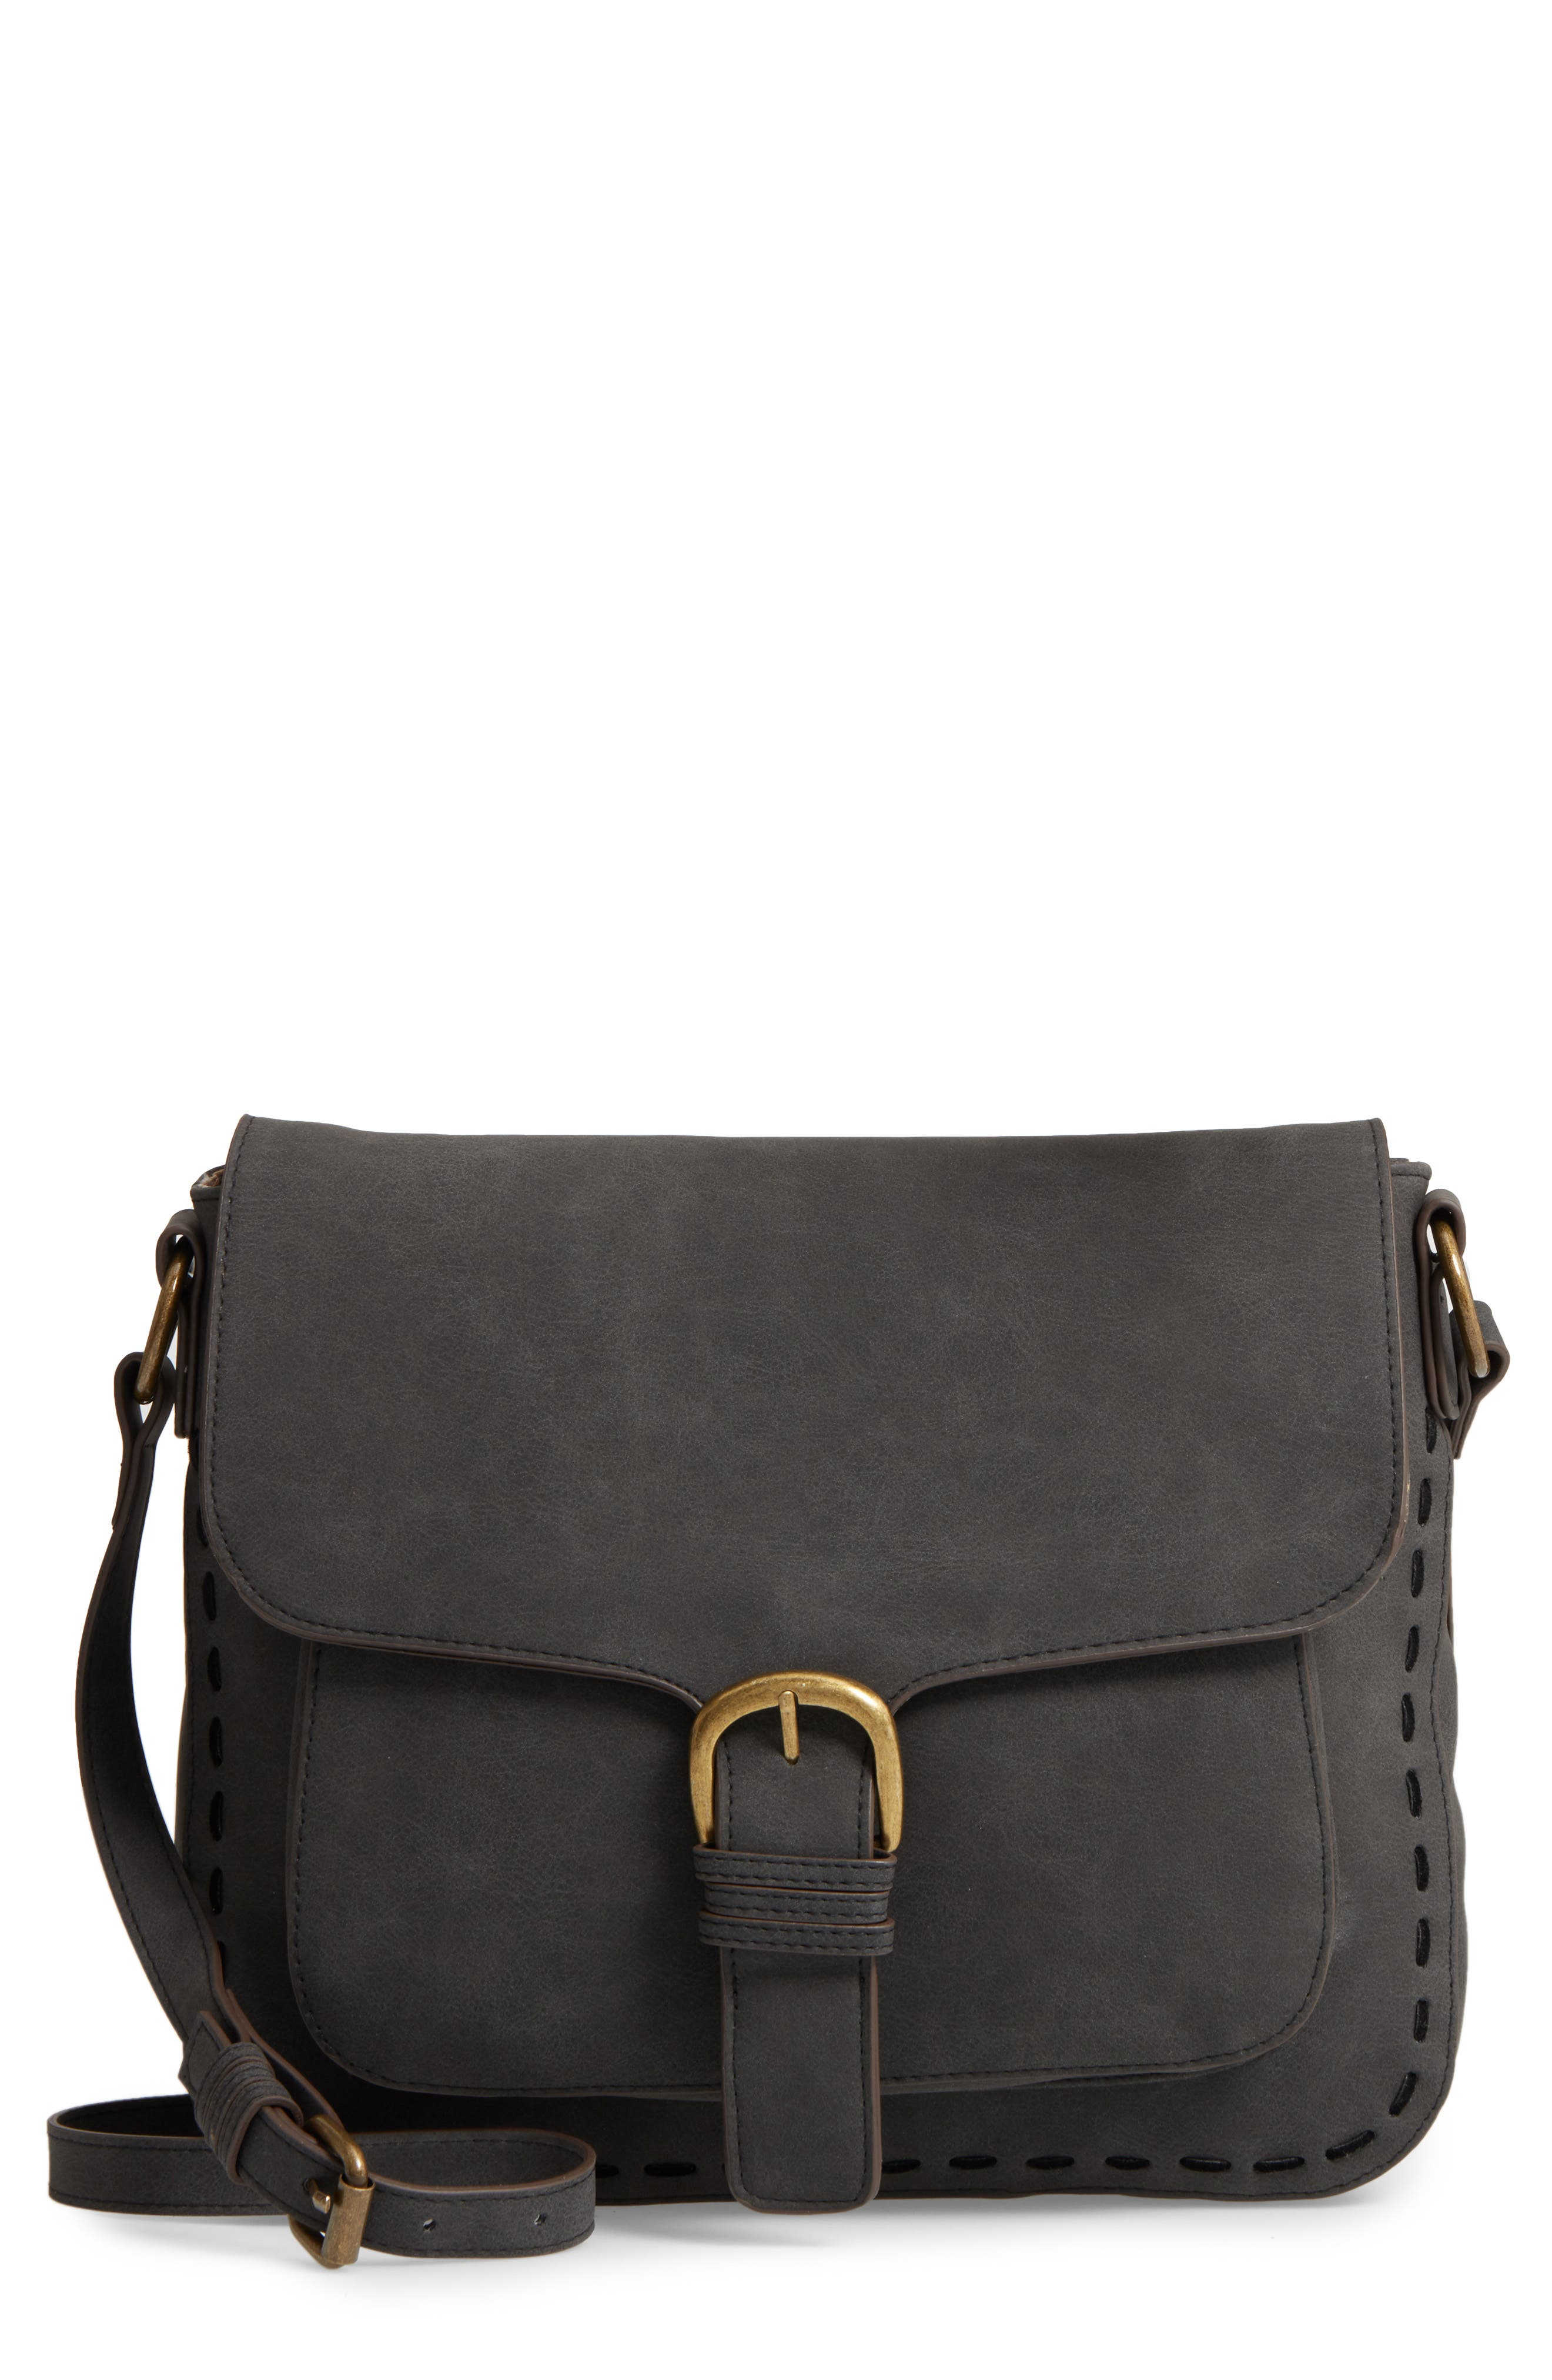 Elle & Jae Gypset 'Mauritius' Faux Leather Crossbody Bag